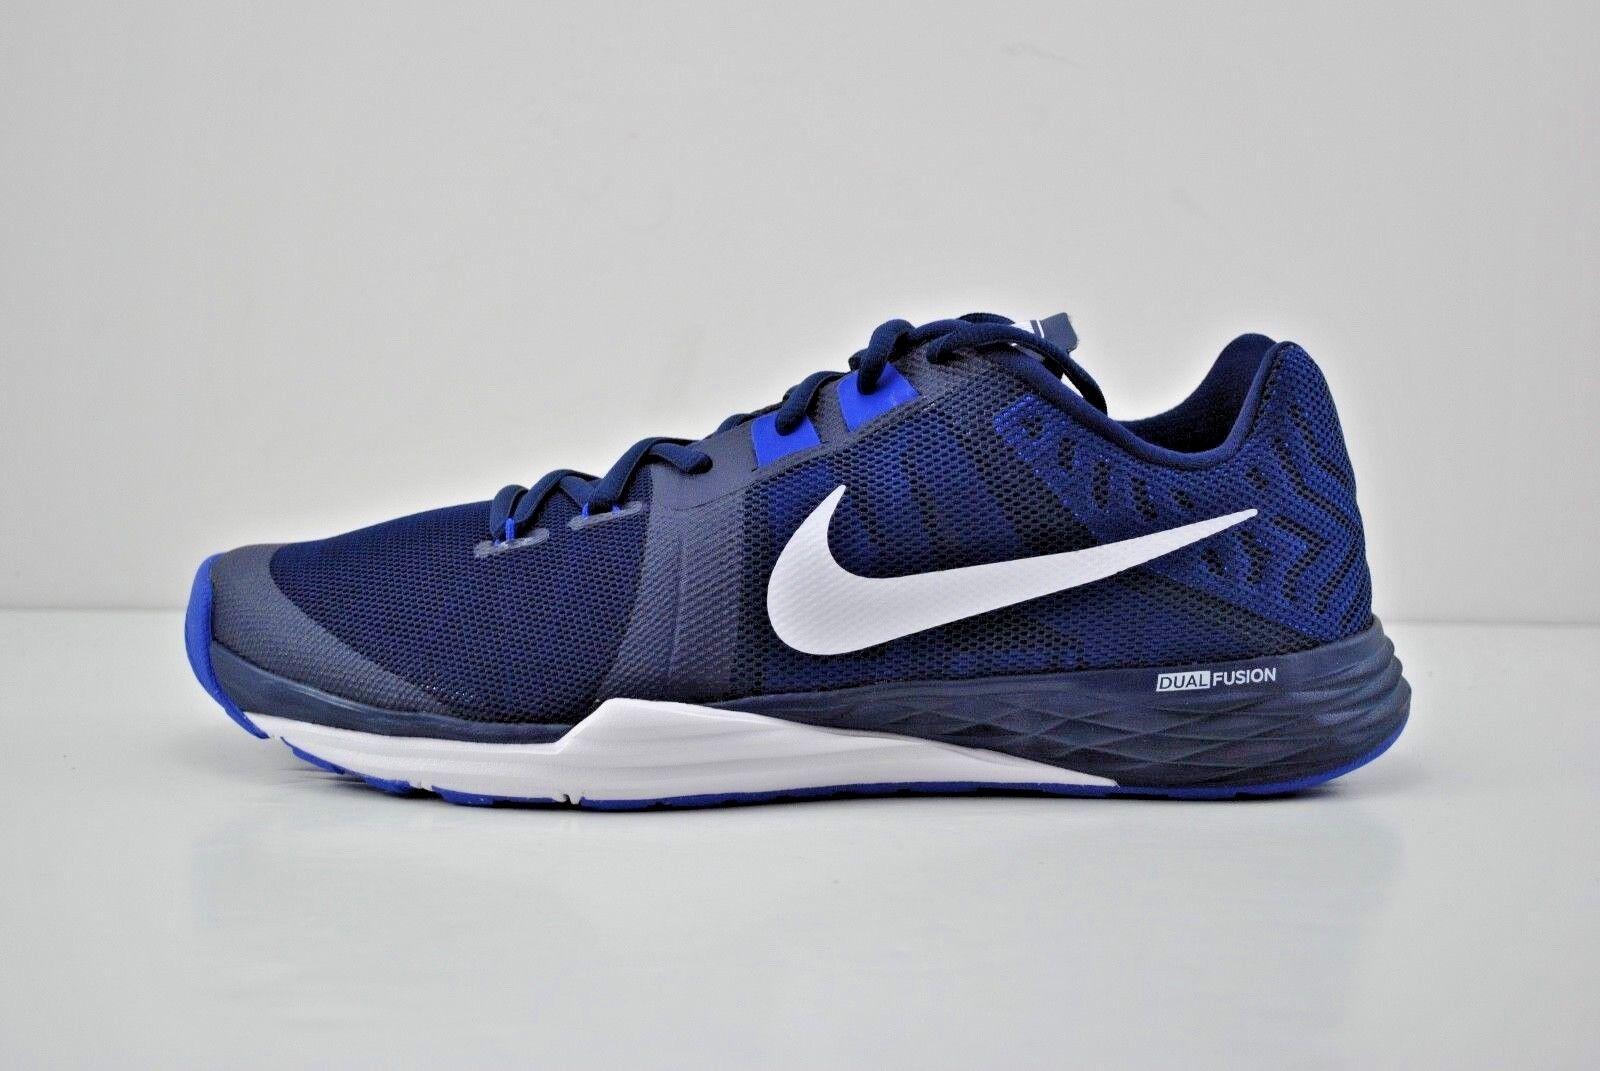 Men Nike Train Prime Iron DF Shoes Comfortable Seasonal clearance sale